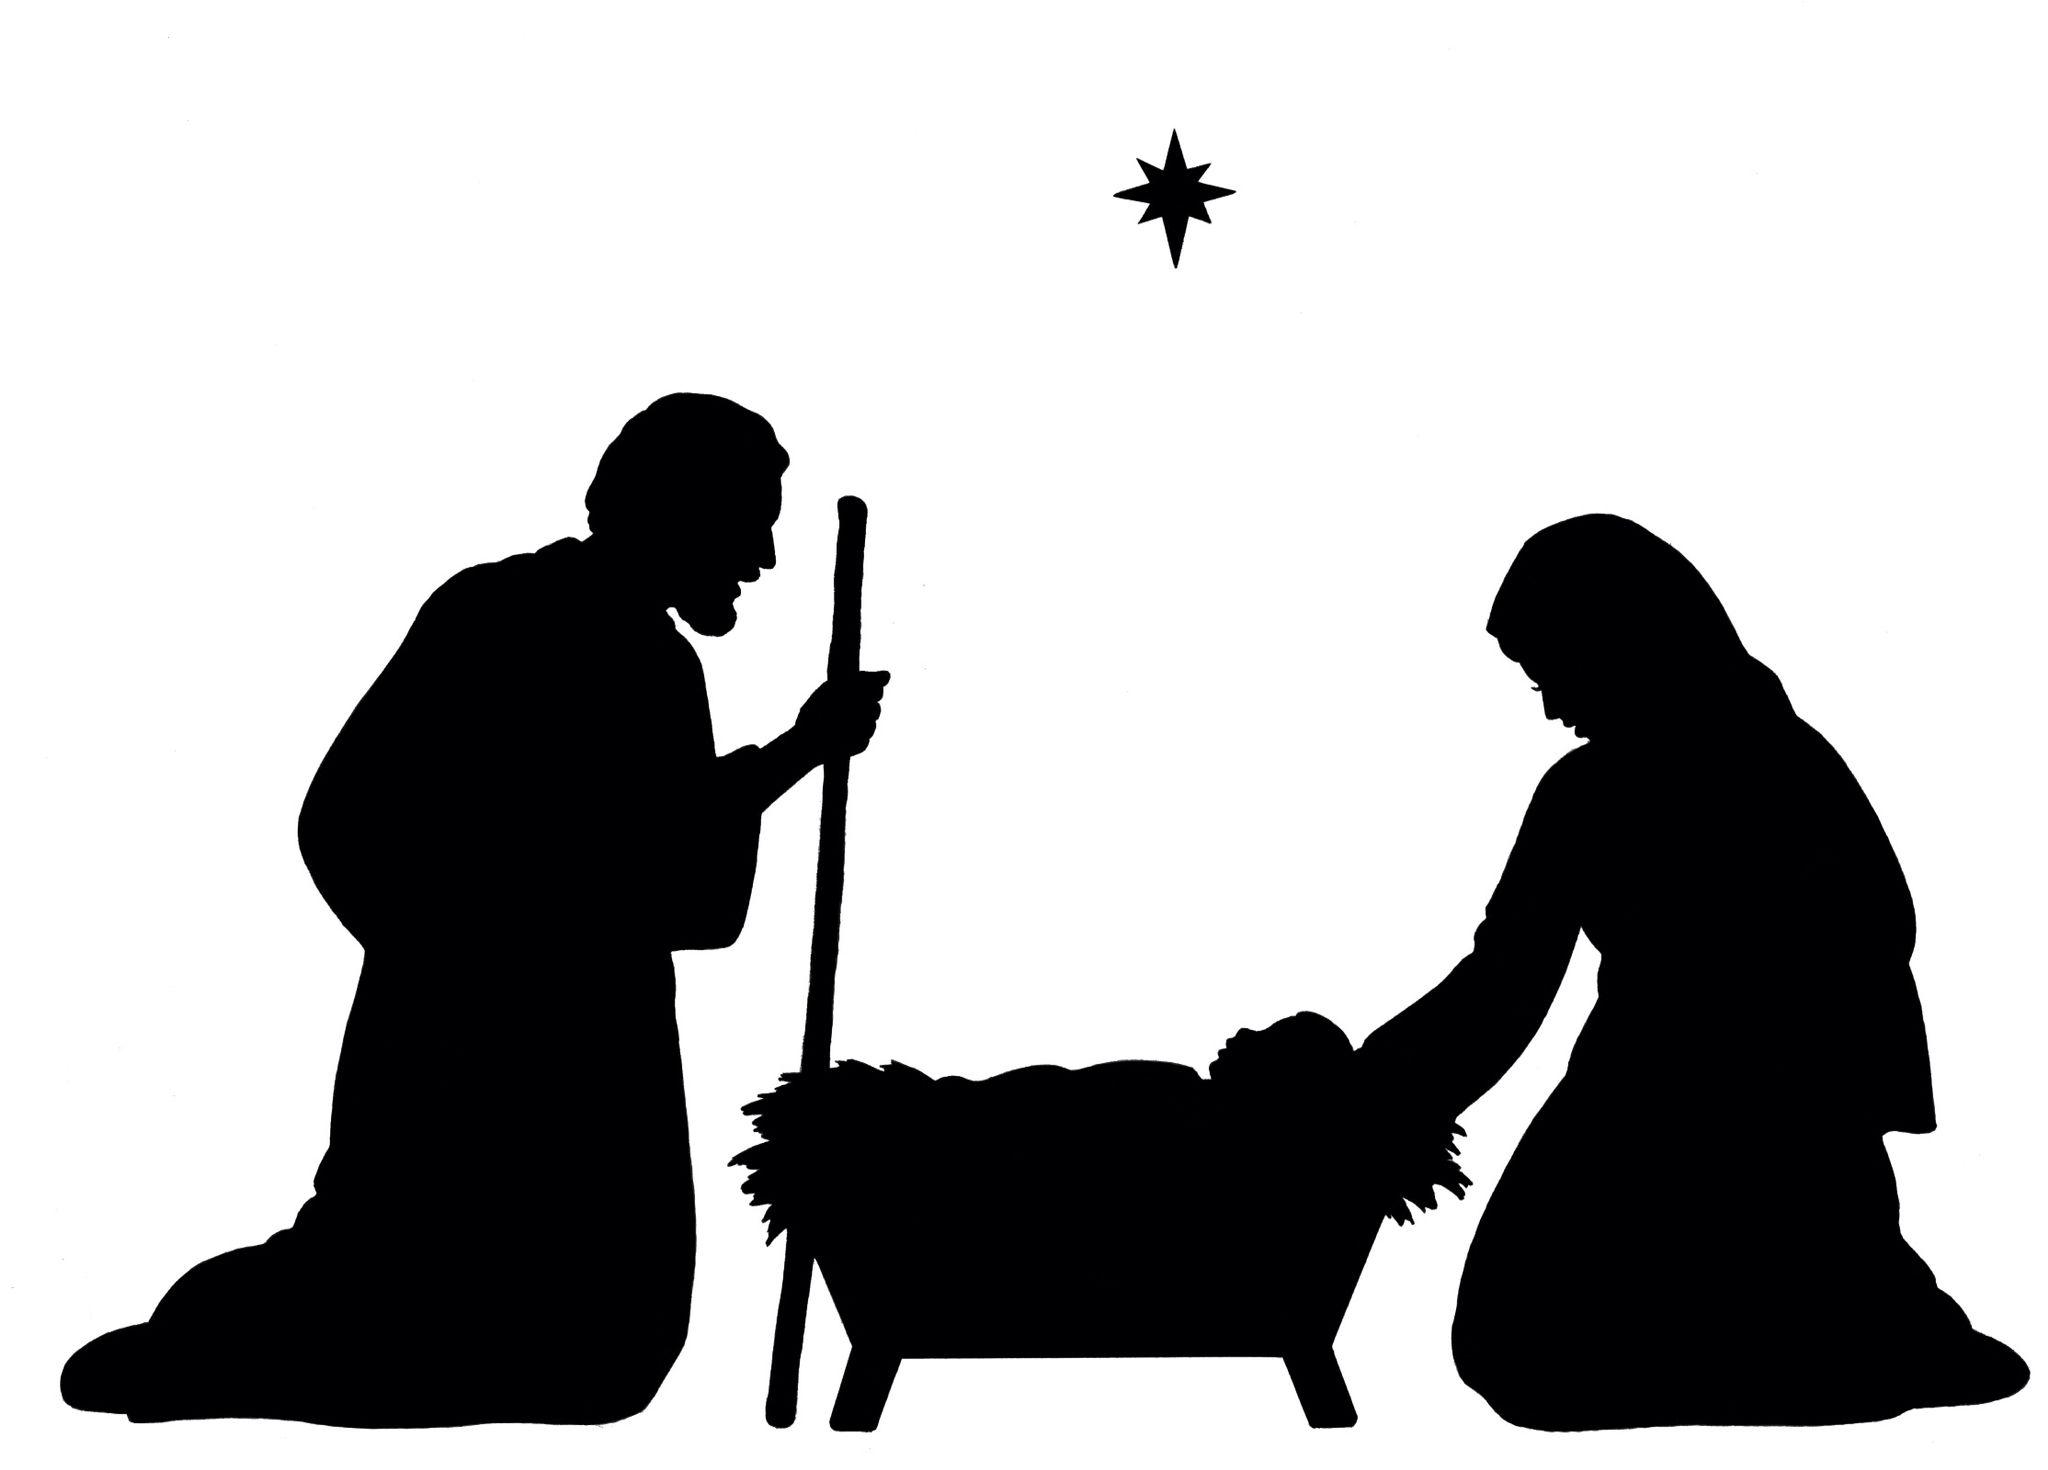 2048x1470 Nacimiento Sud Lds Navidad, Silhouette And Cricut